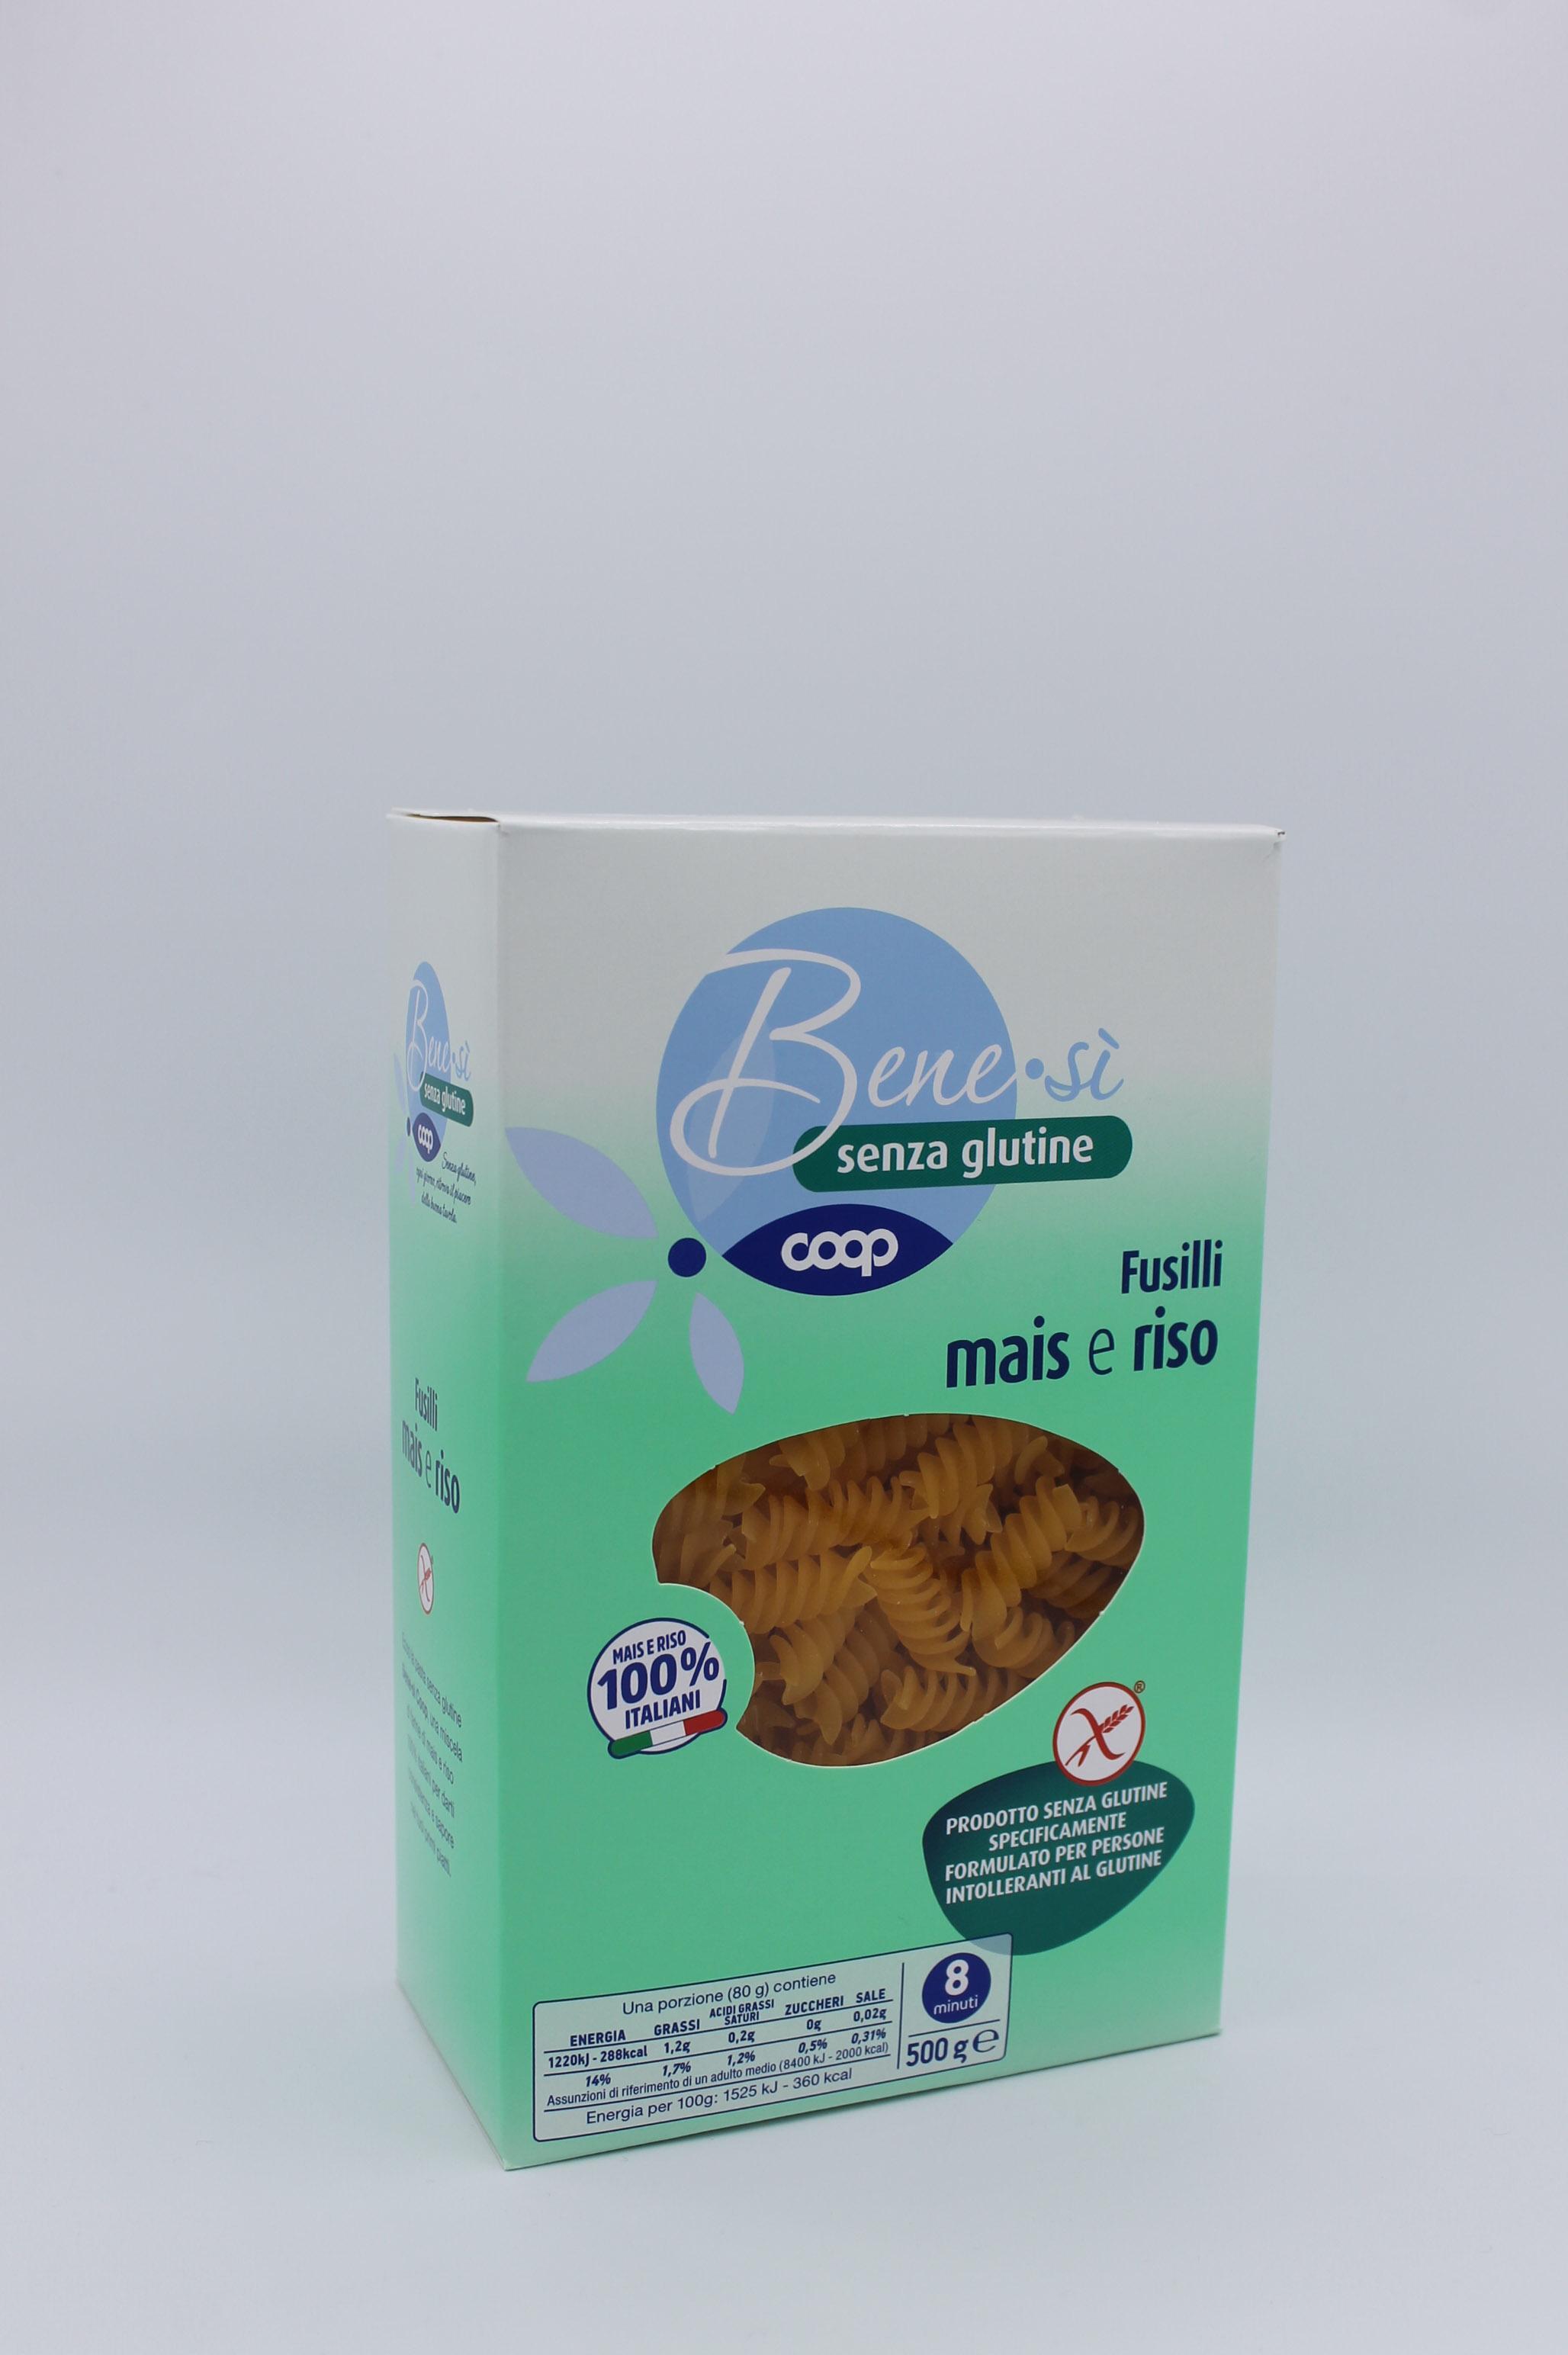 Coop benesì pasta corta senza glutine 500gr vari formati.